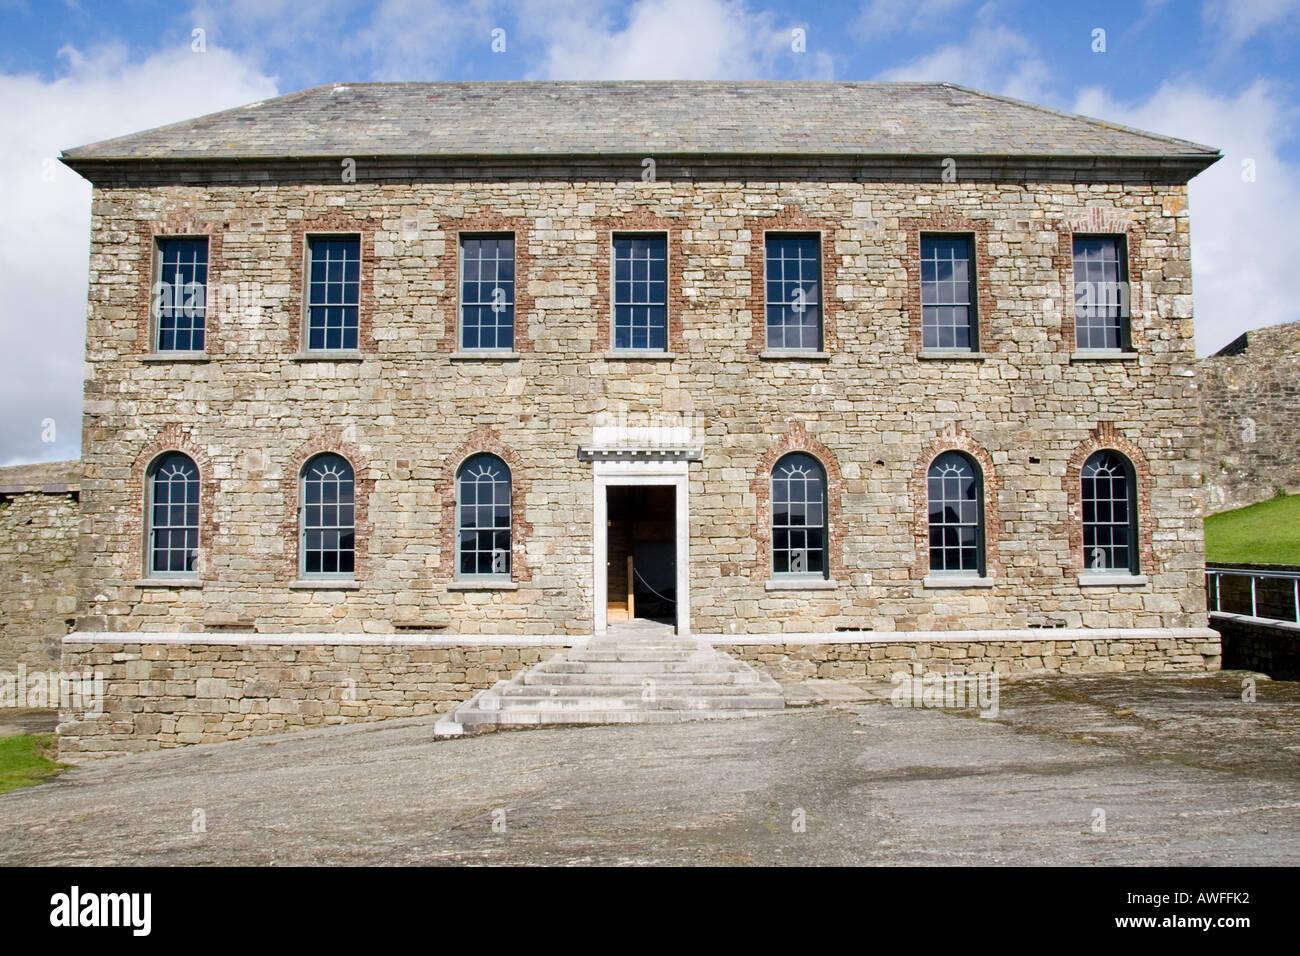 Ireland Stone Building : Charles fort kinsale county cork ireland stone building